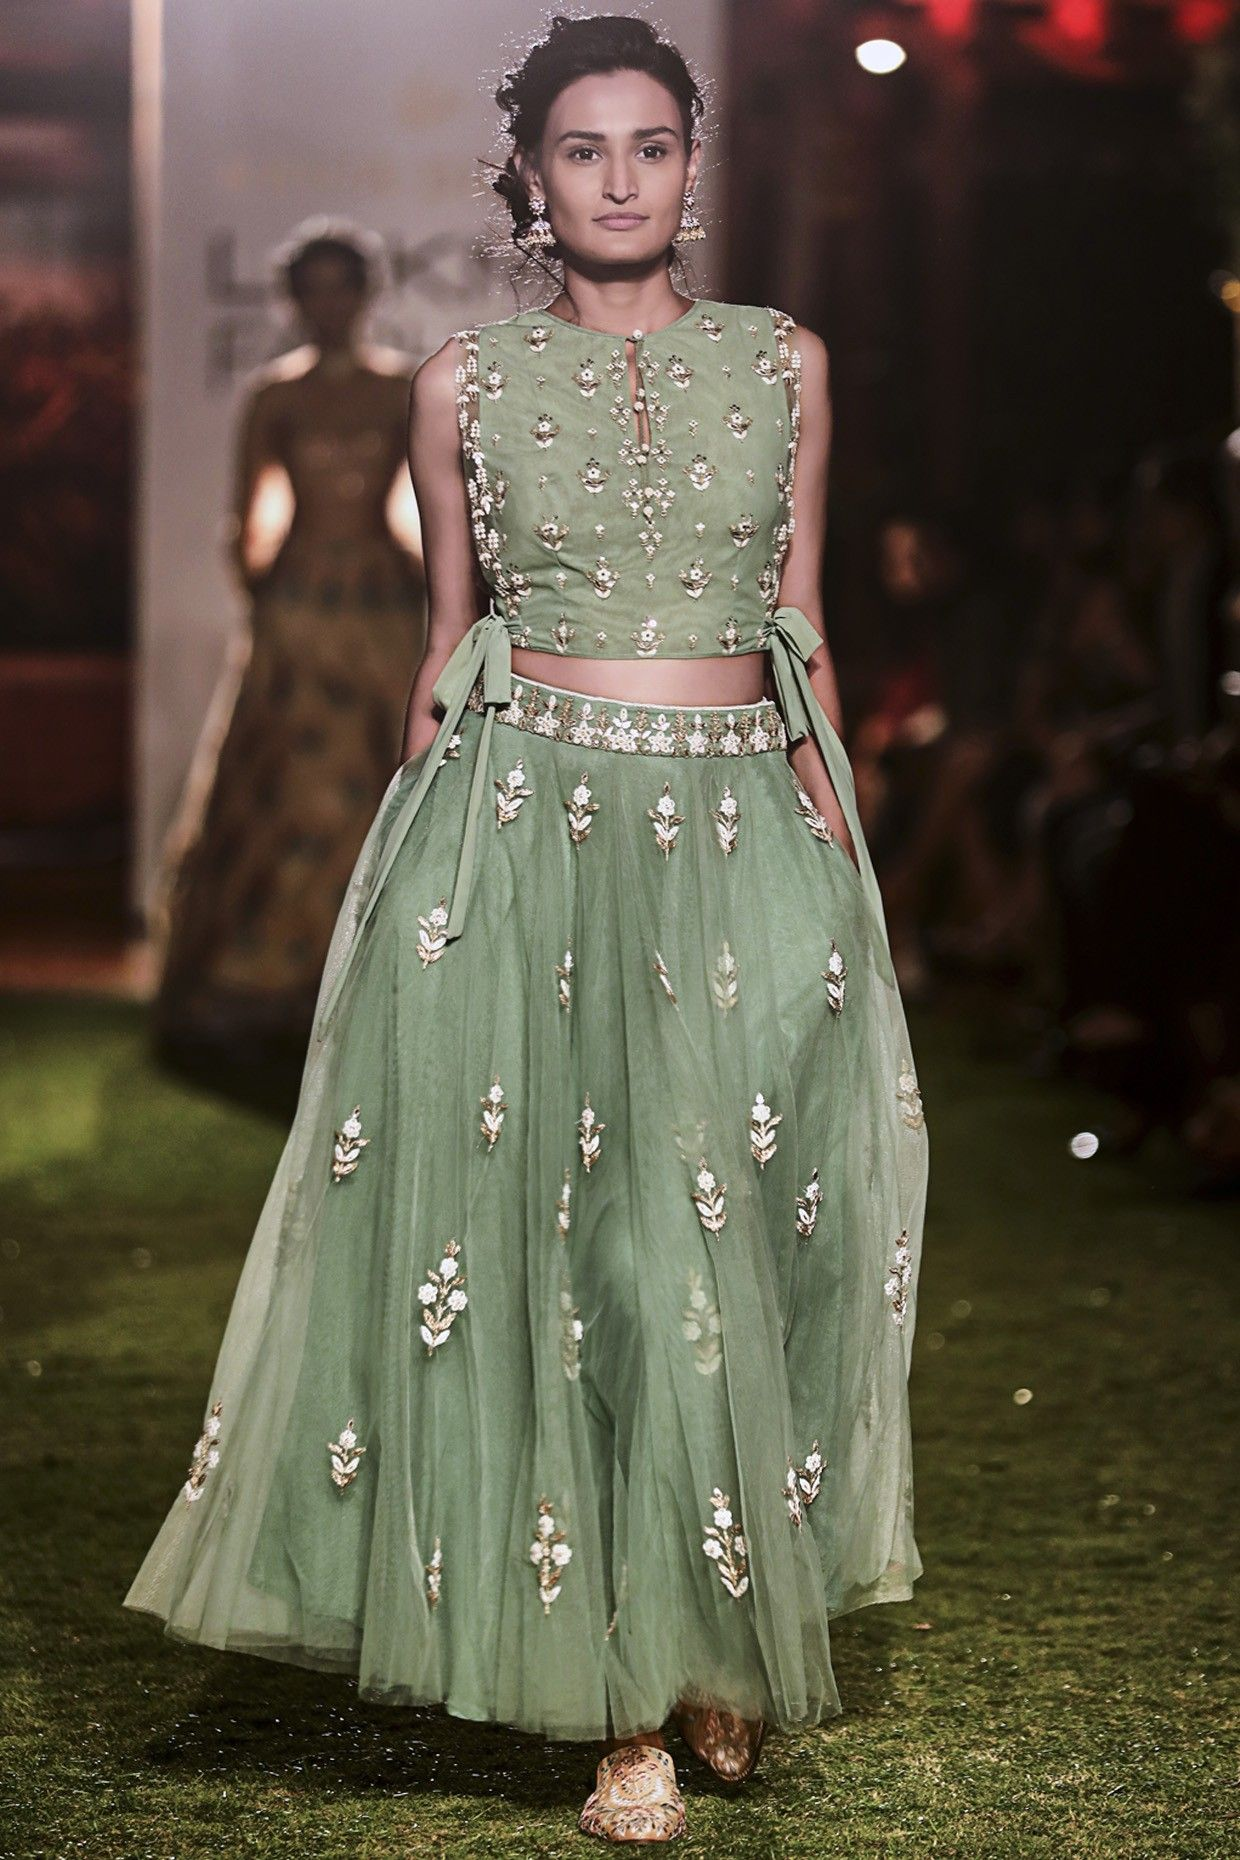 Anita Dongre Sage Green Embroidered Crop Top And Skirt Set Shop Now Anitadogre Sagegreen Designer Blouse Patterns Designer Dresses Lehenga Blouse Designs